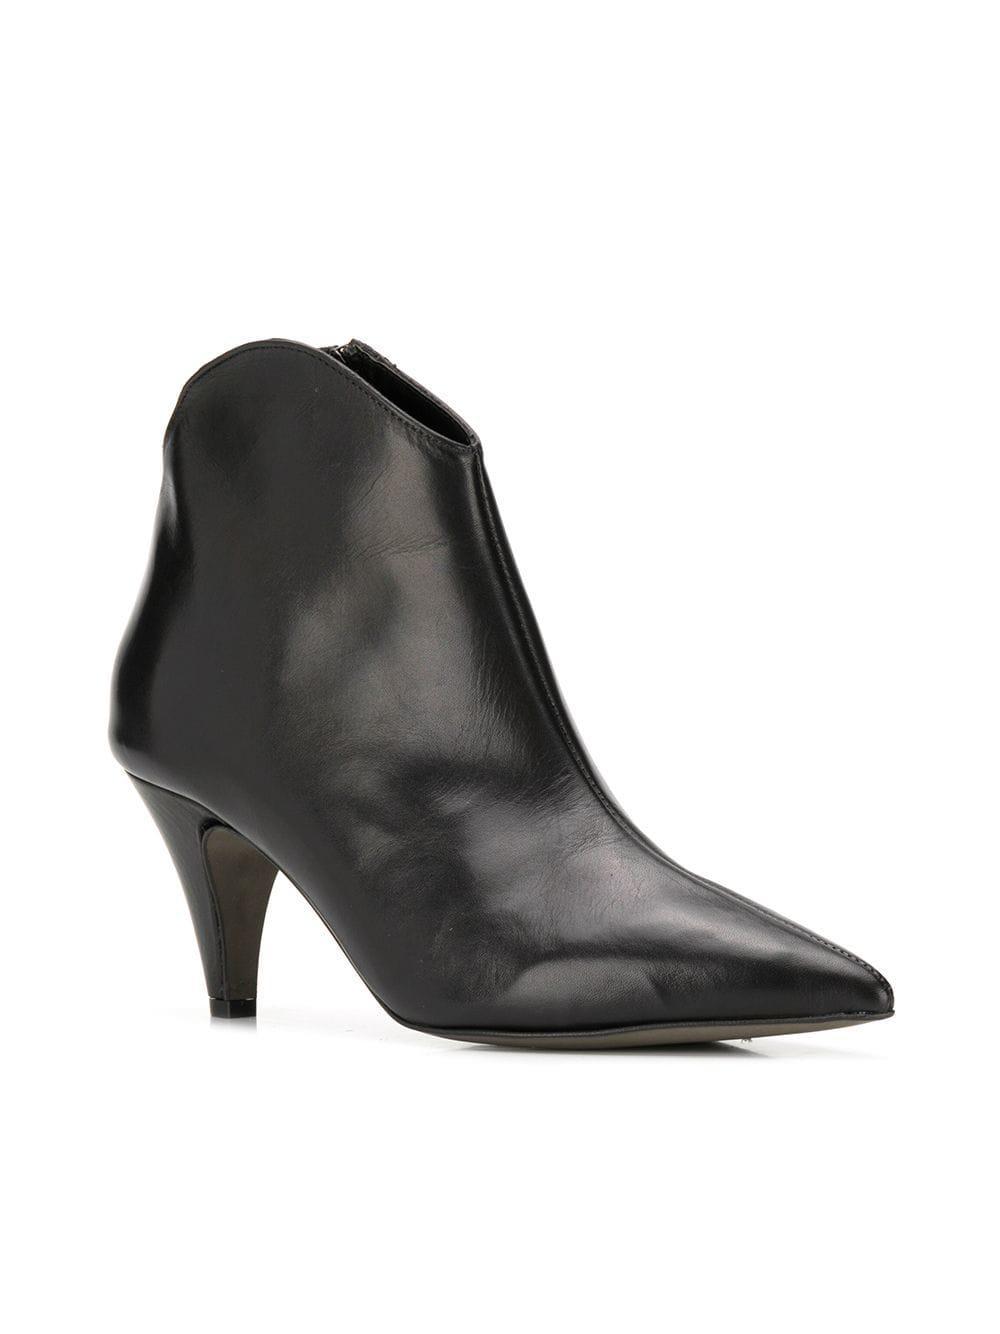 920b1f498c1 Rebecca Minkoff - Black Pointed Ankle Boots - Lyst. View fullscreen